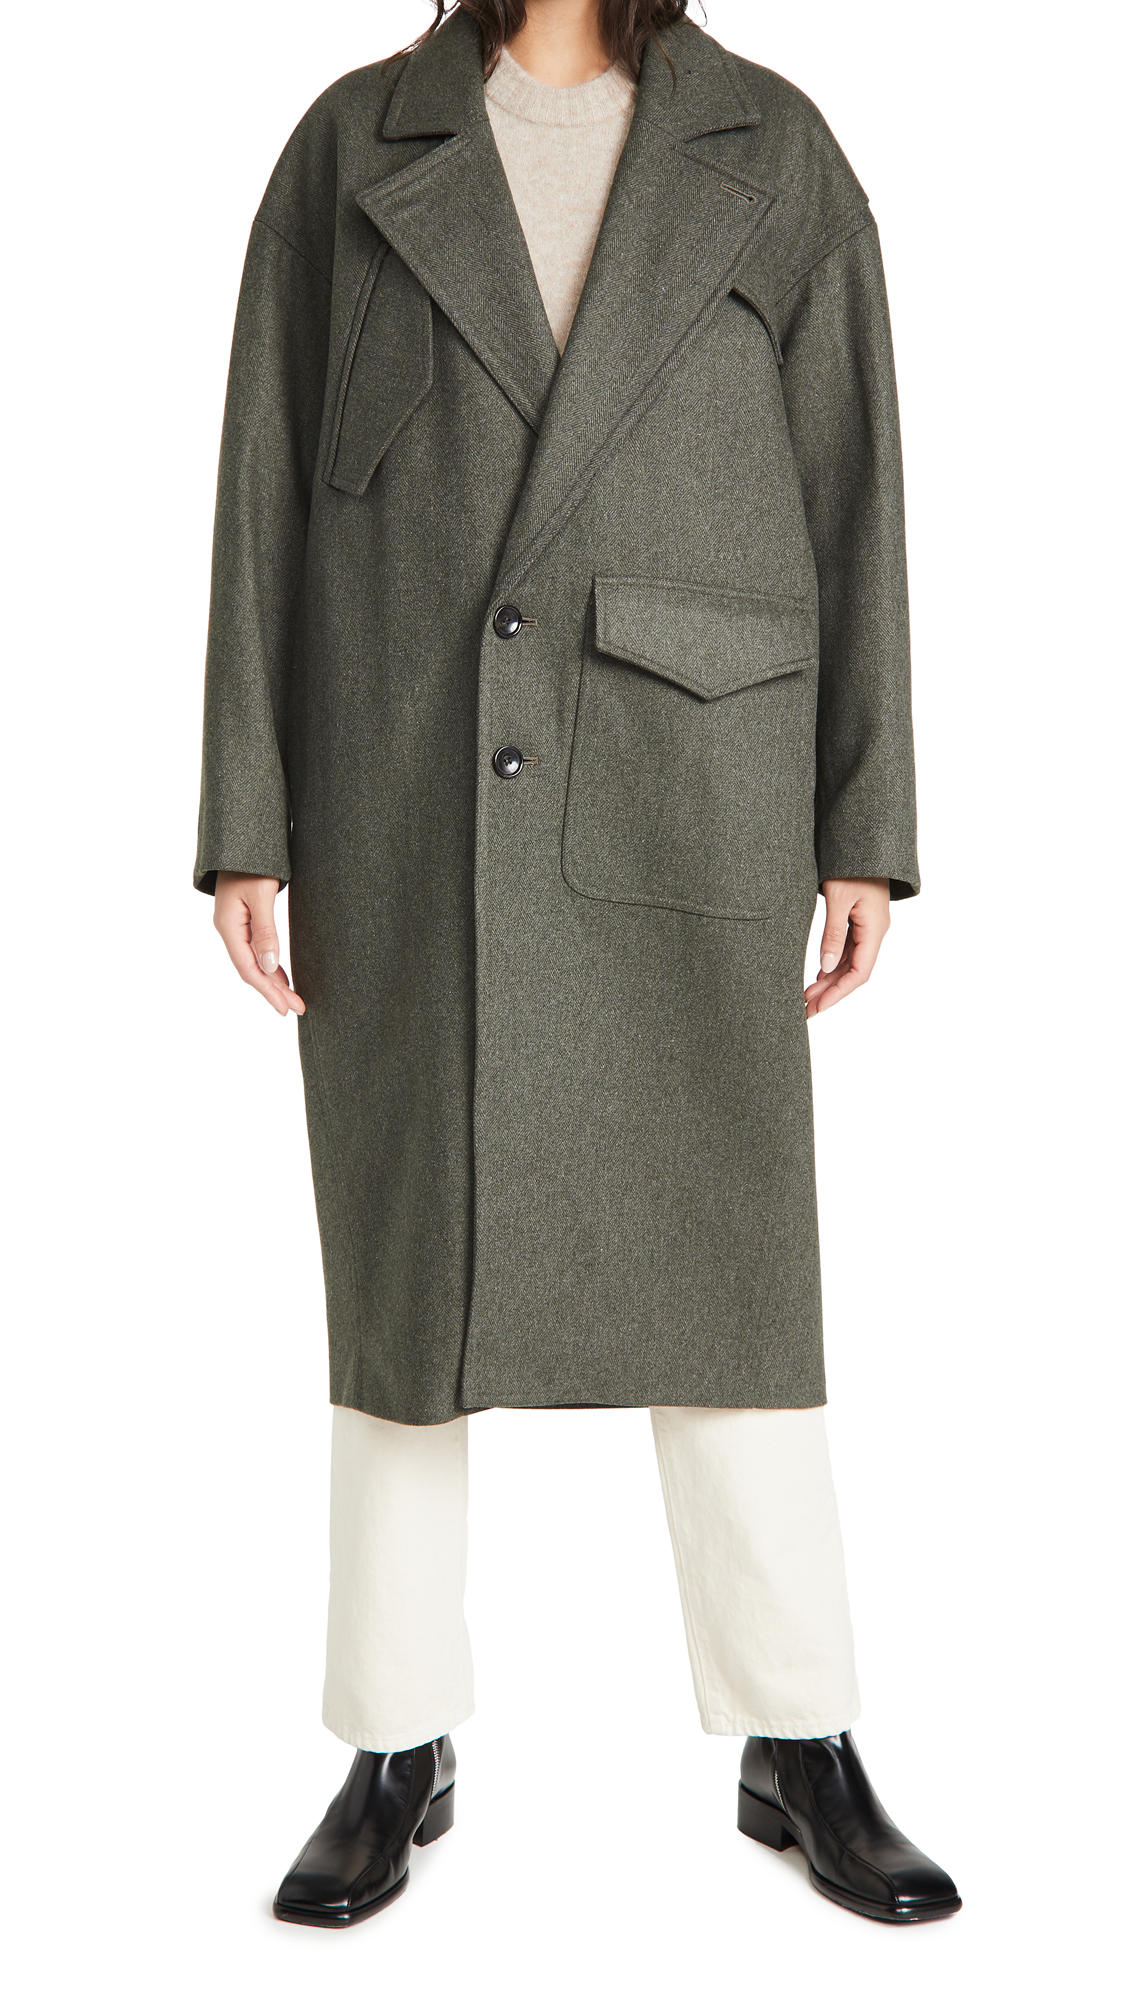 Tibi Cocoon Shape Maxi Coat